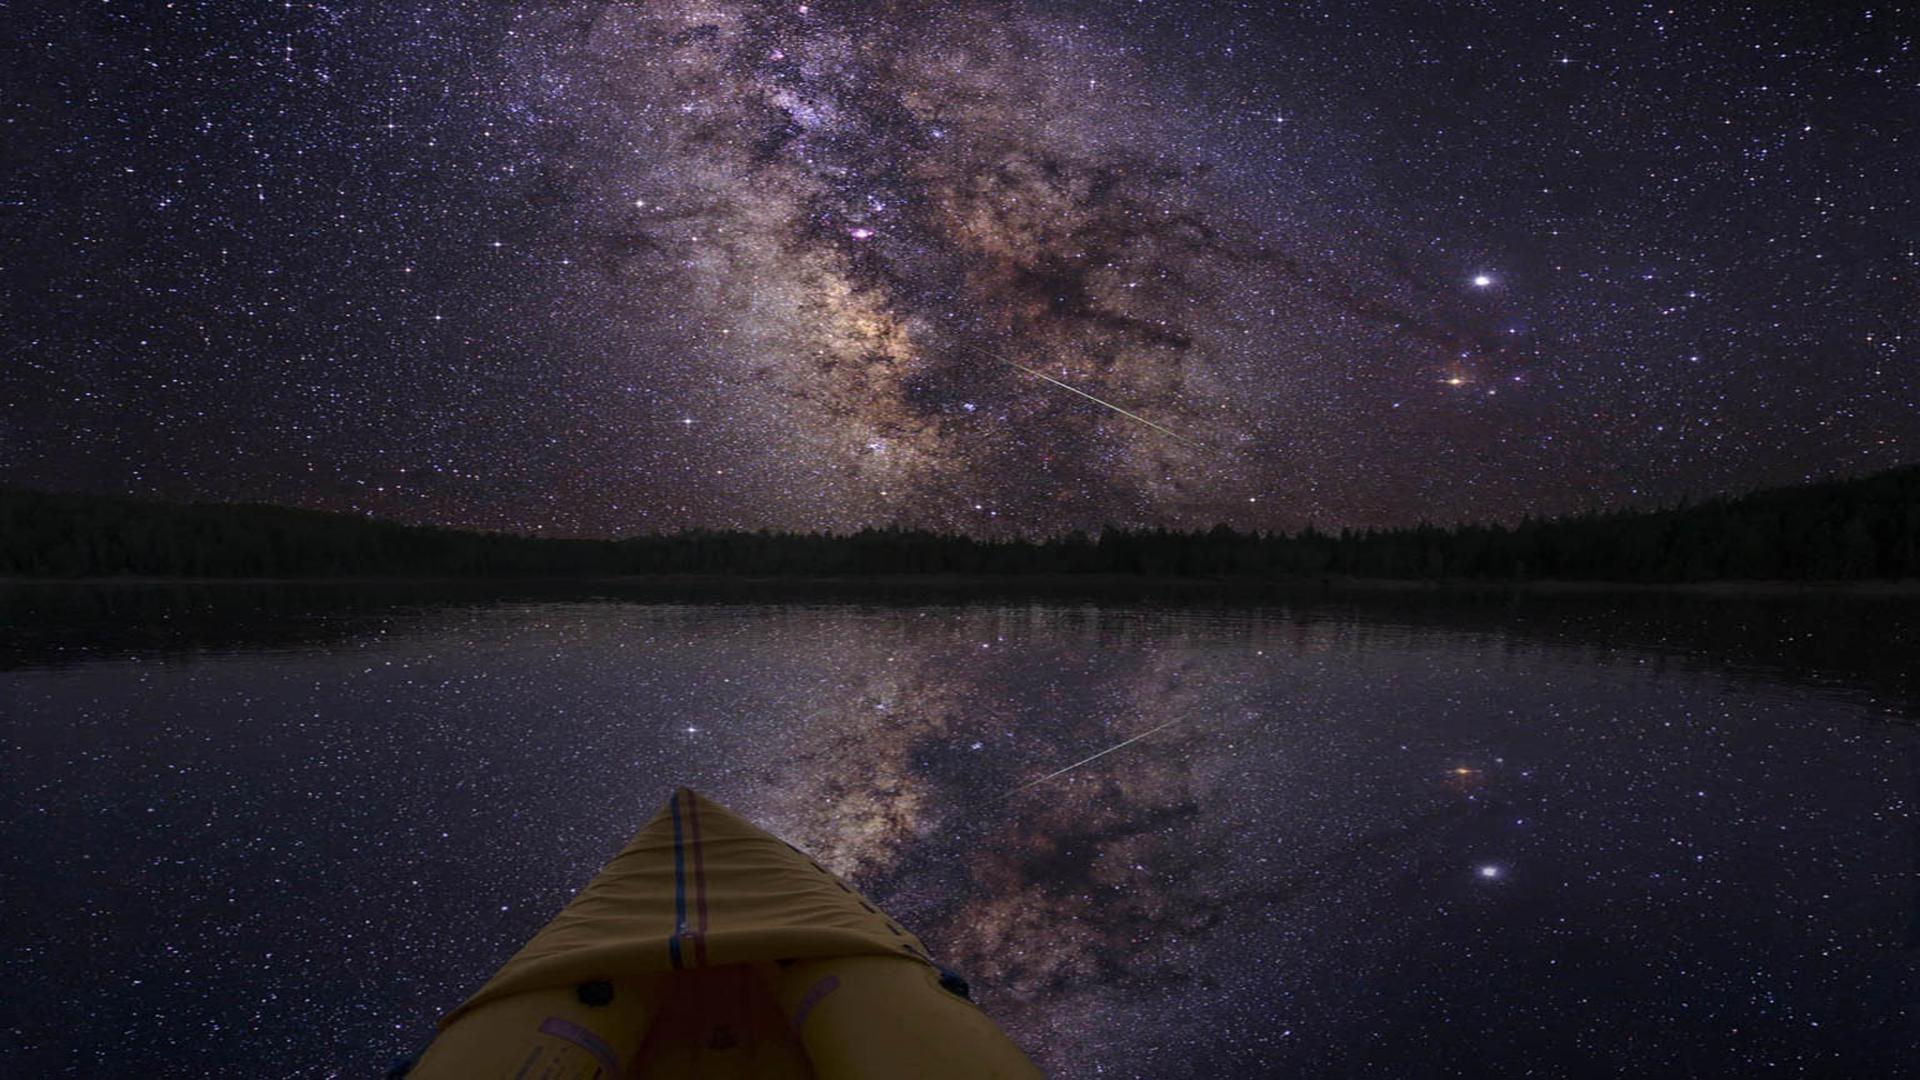 HD Milky Way Wallpapers